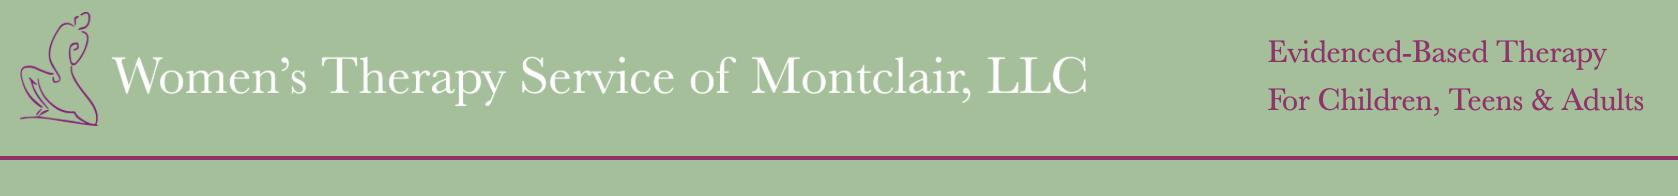 The Women's Therapy Service of Montclair, LLC The Daybreak DBT Program